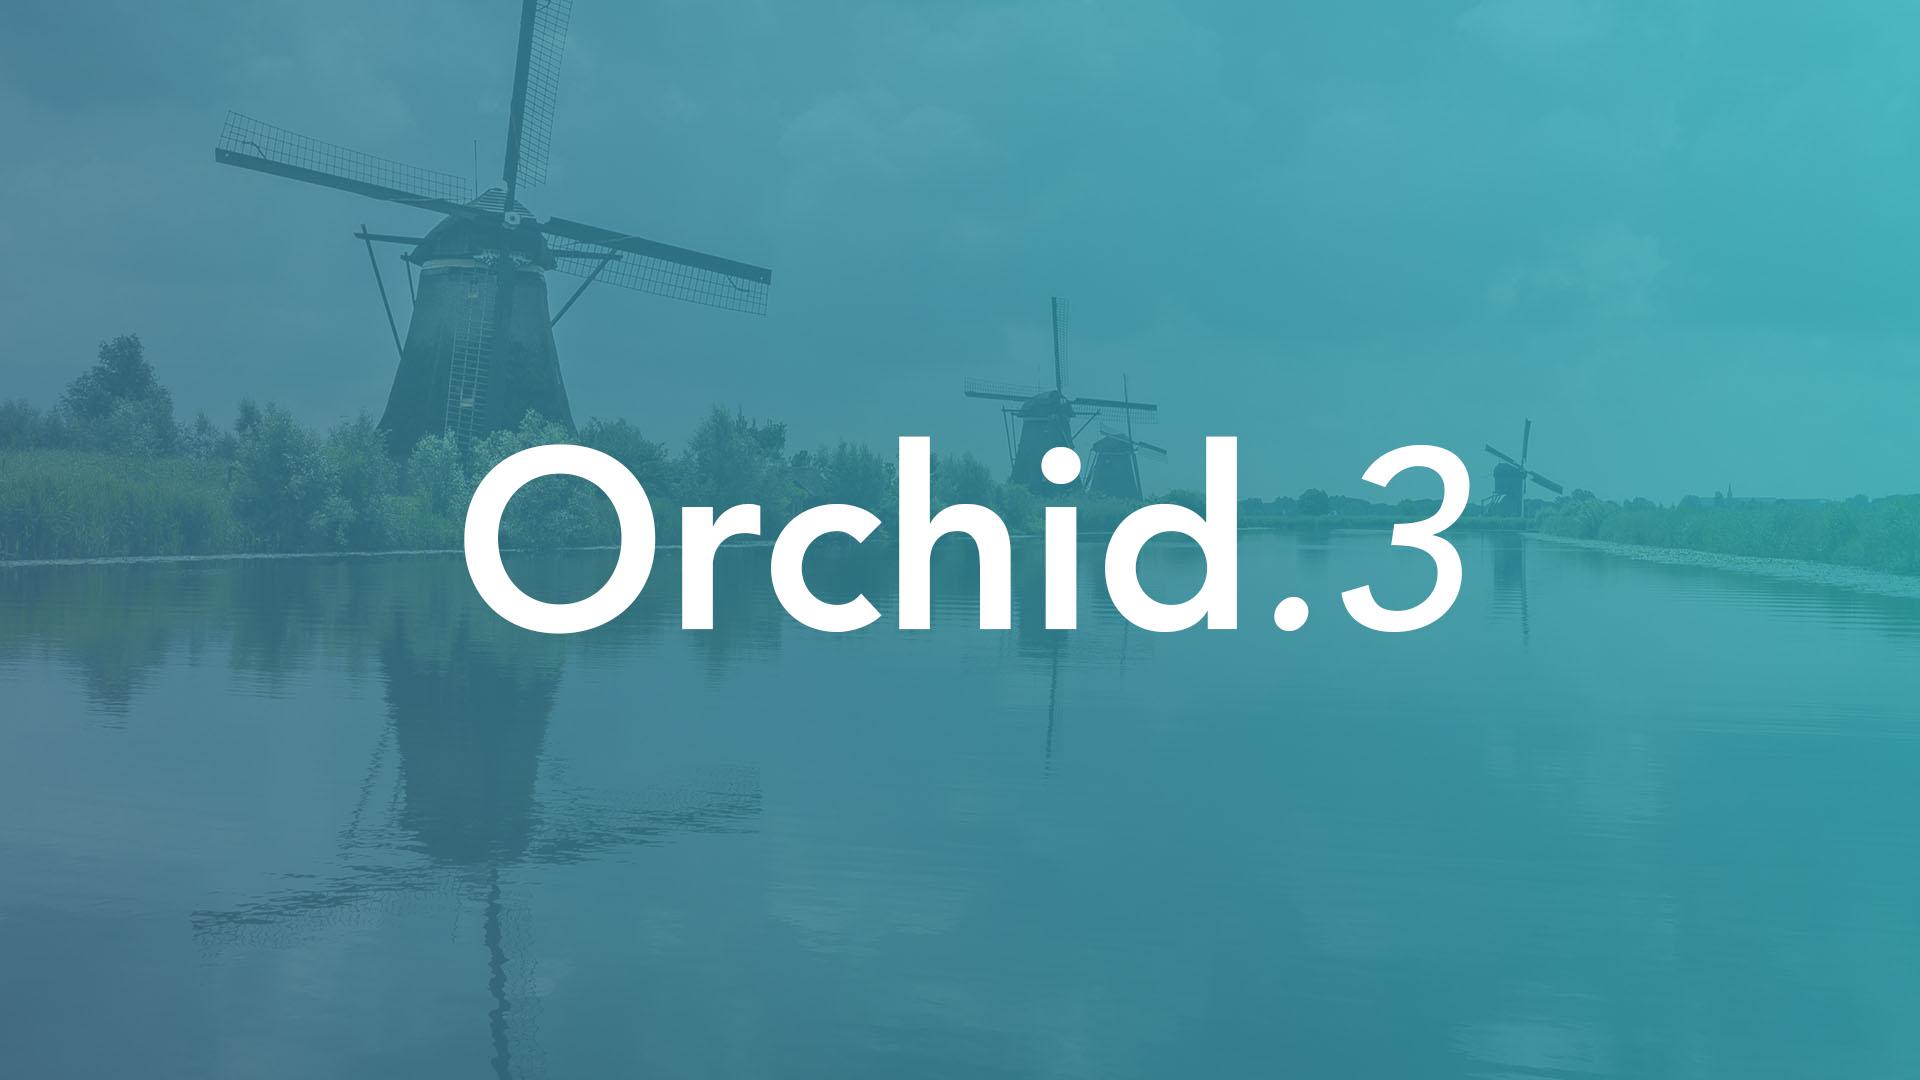 CodeGrade version Orchid.3